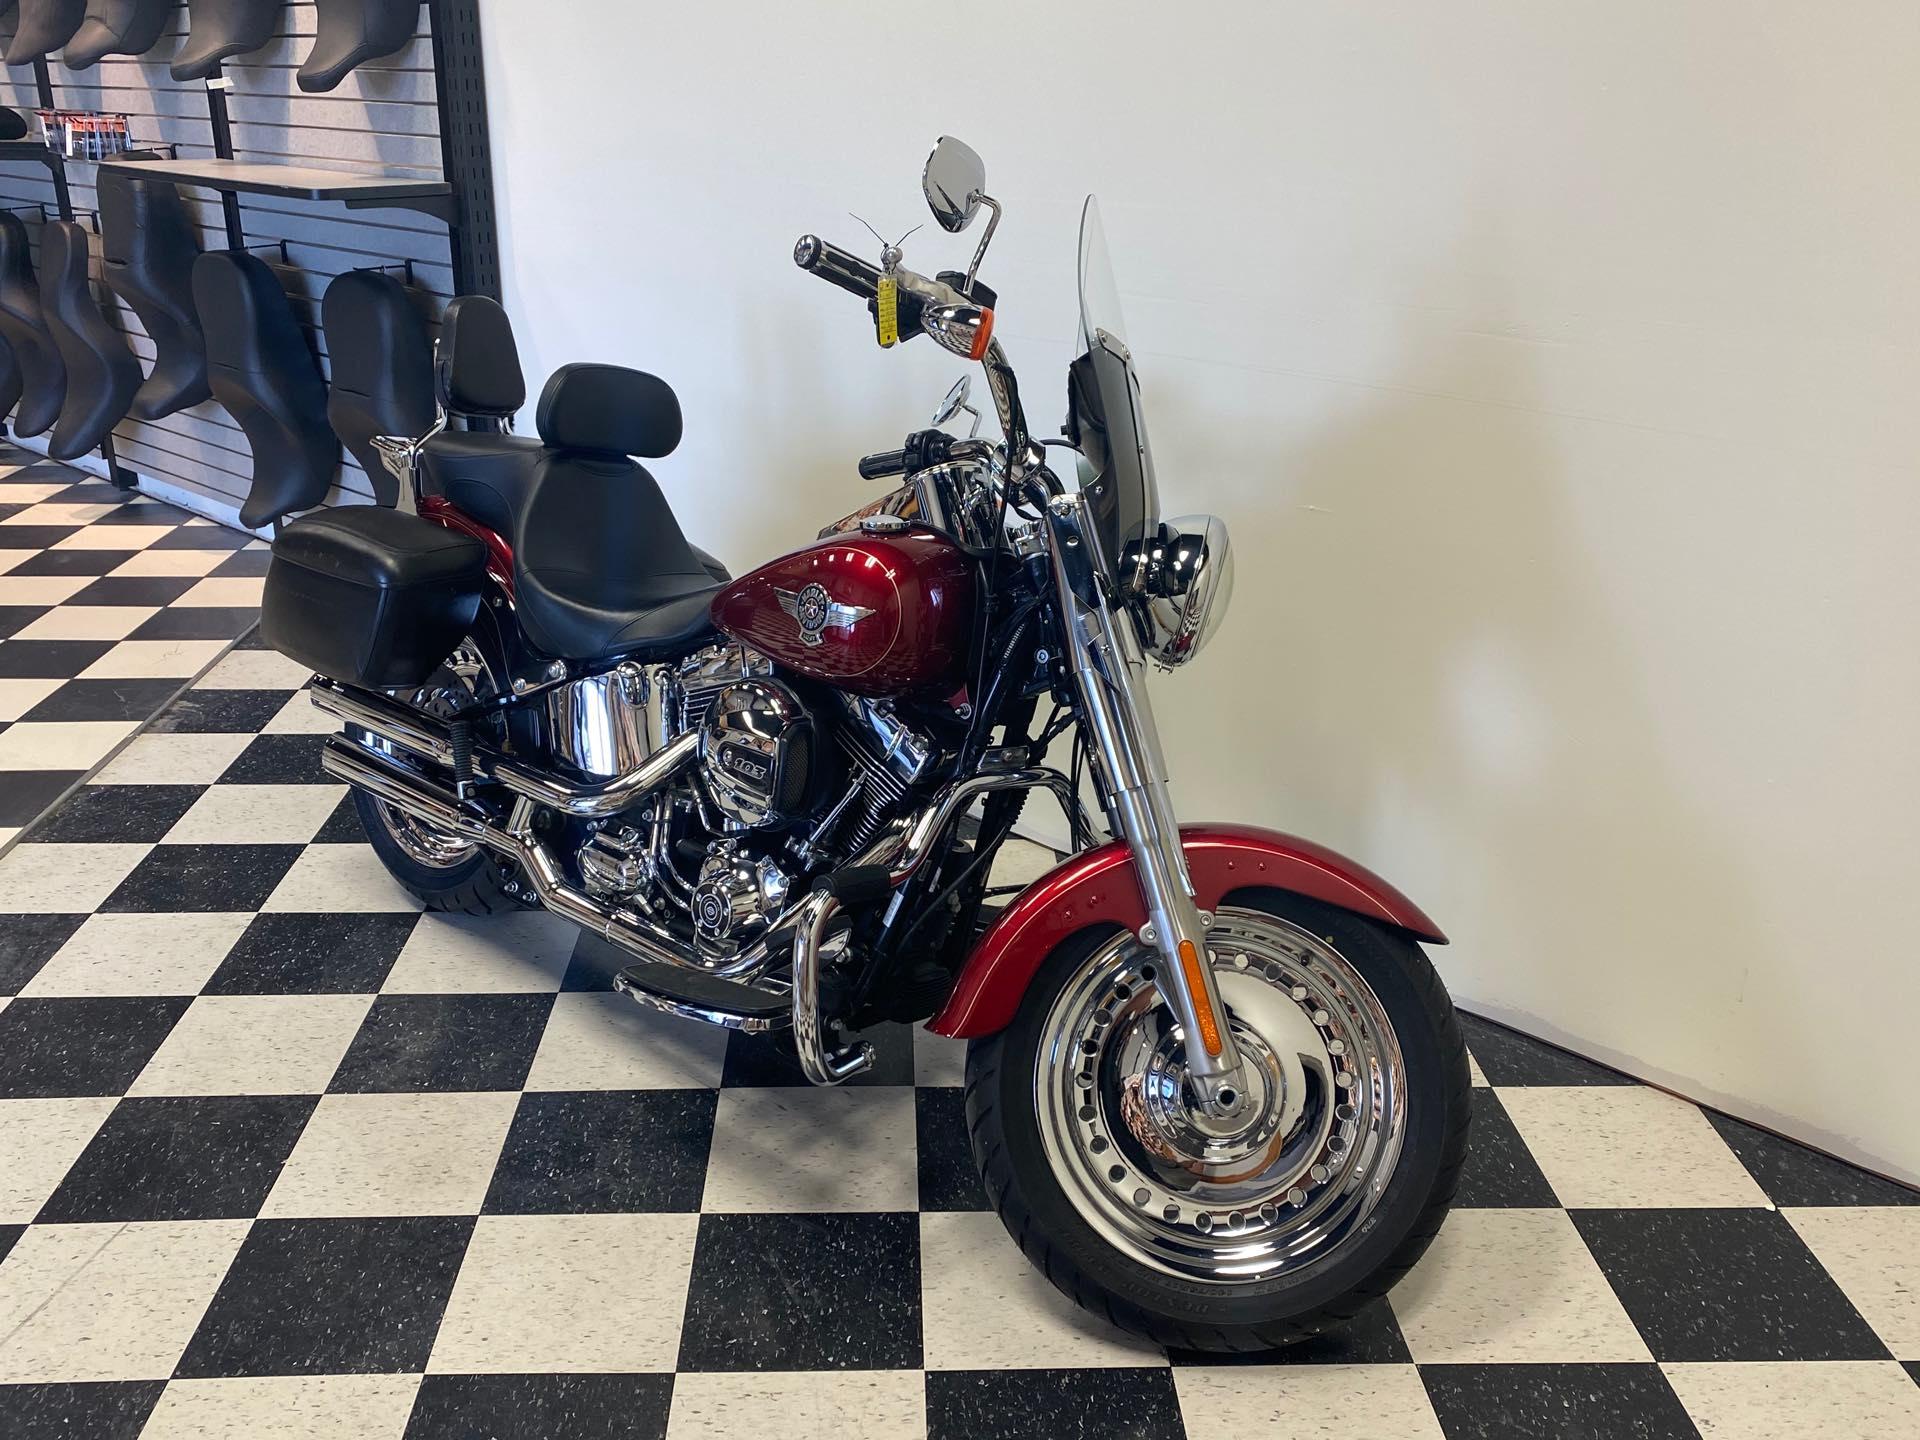 2016 Harley-Davidson Softail Fat Boy at Deluxe Harley Davidson